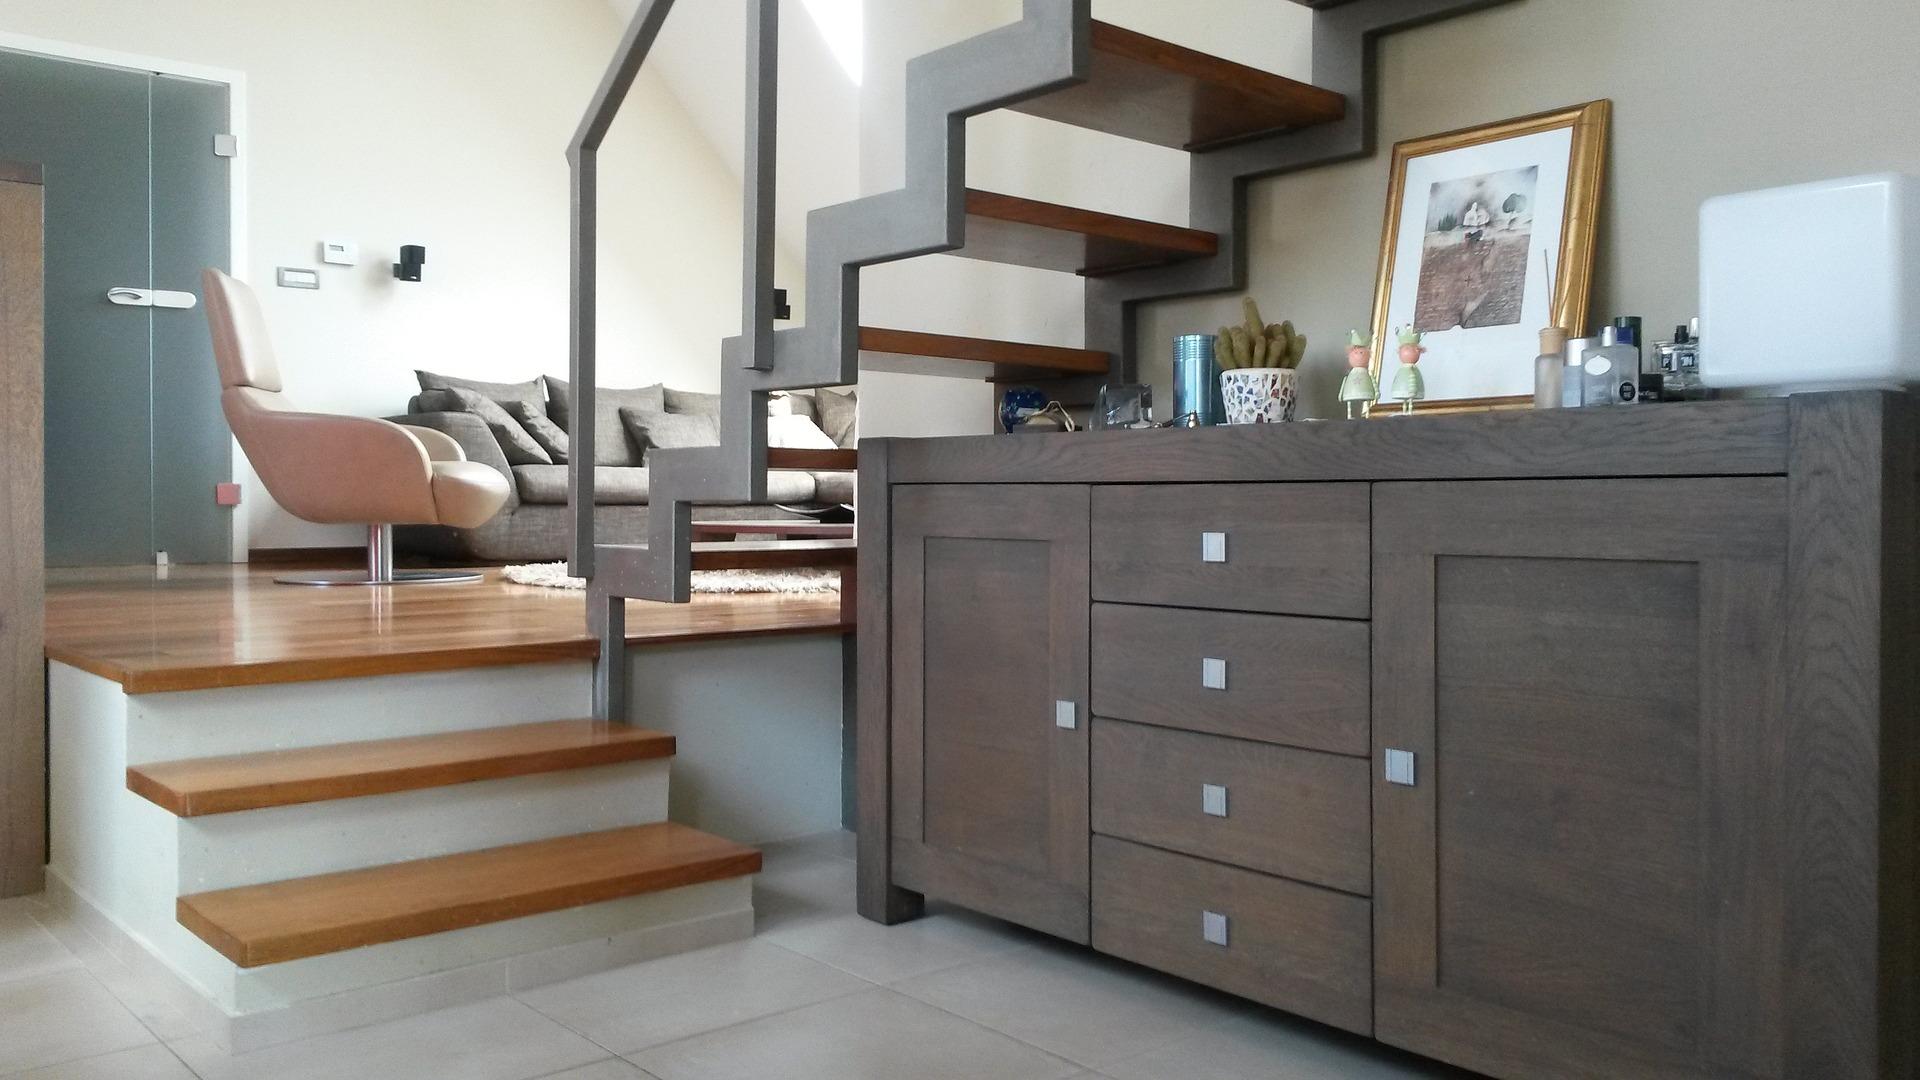 Trap in woonkamer | Woon & Leven